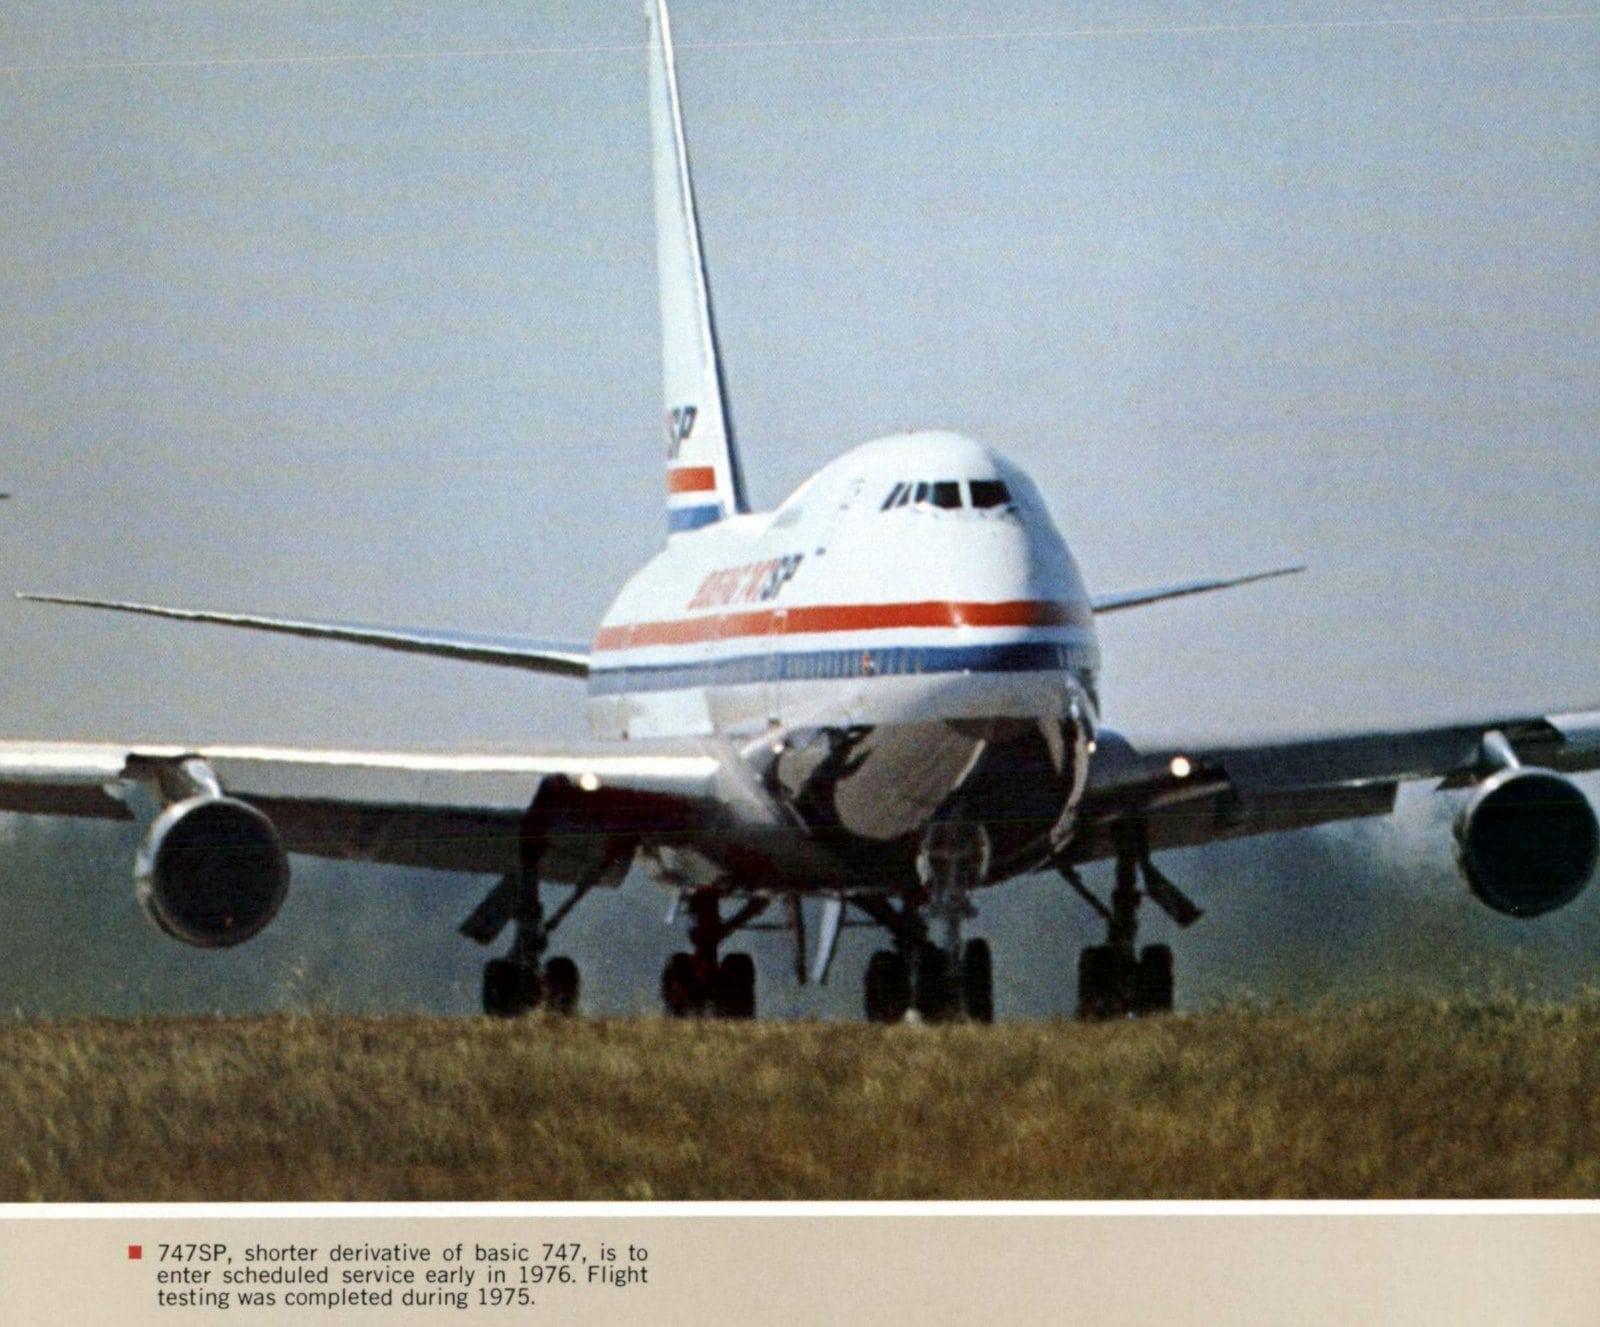 Boeing 747SP flight testing (1975)